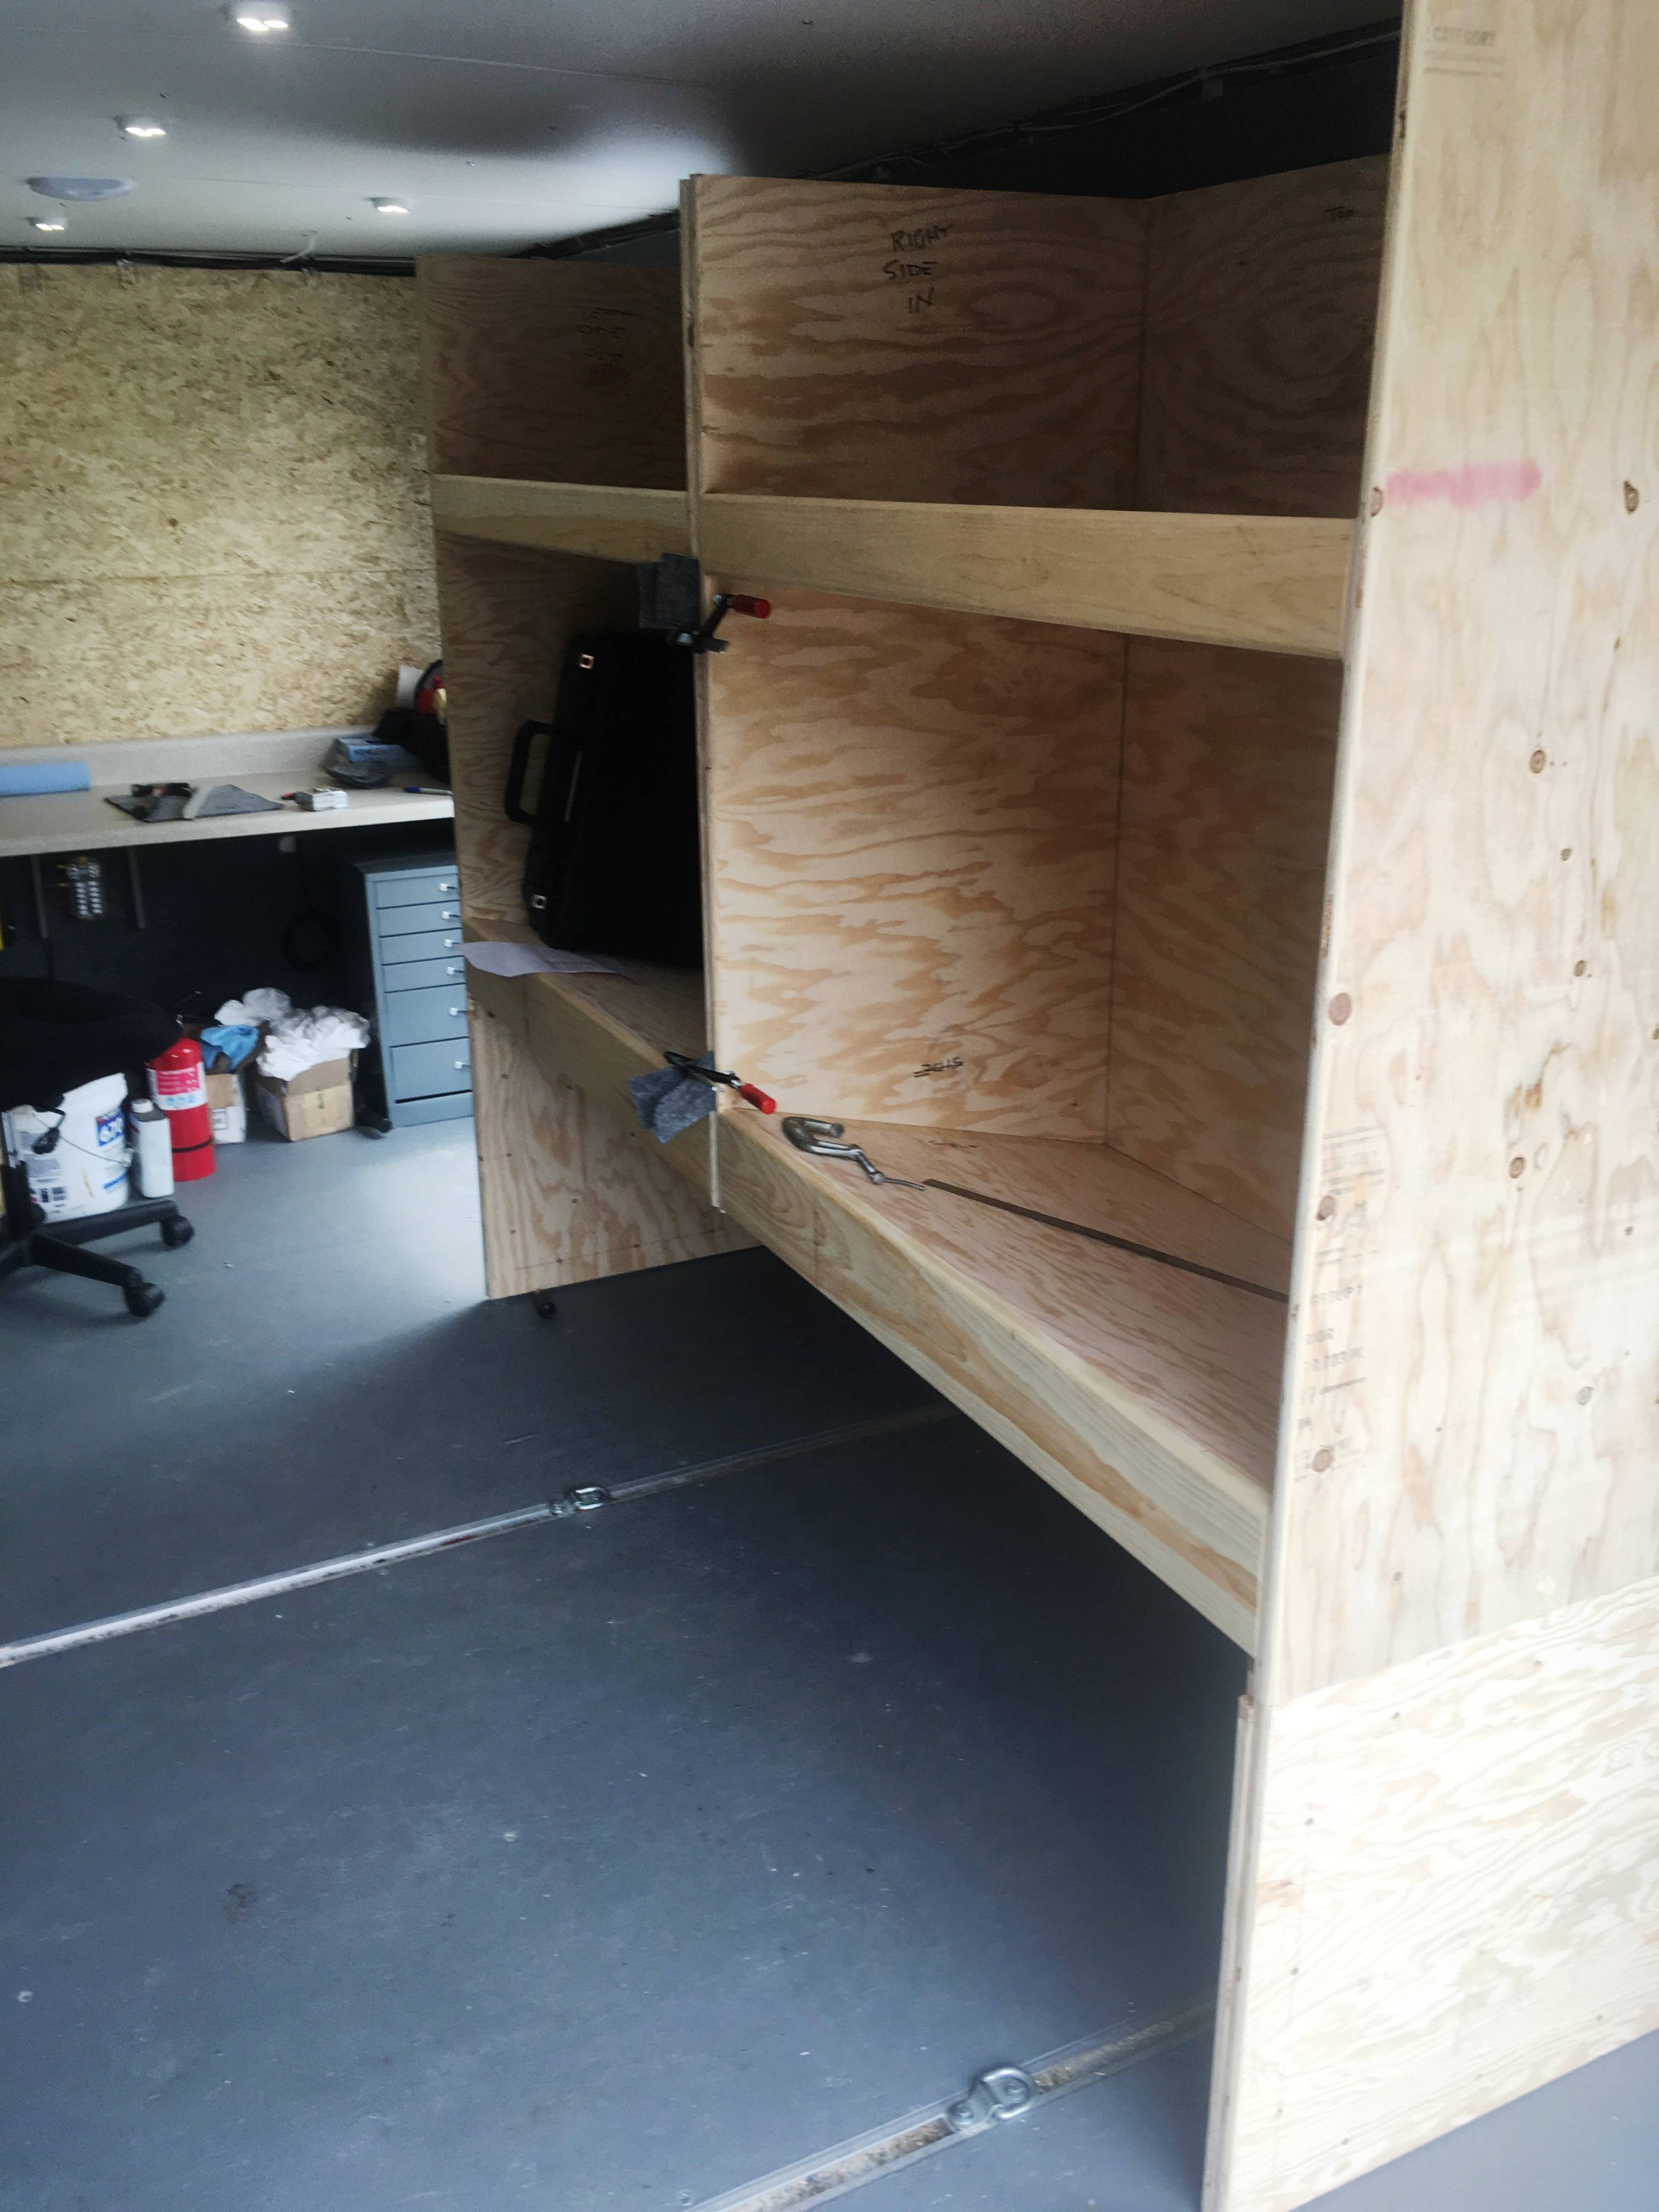 Testing fitting the equipment shelves before carpeting